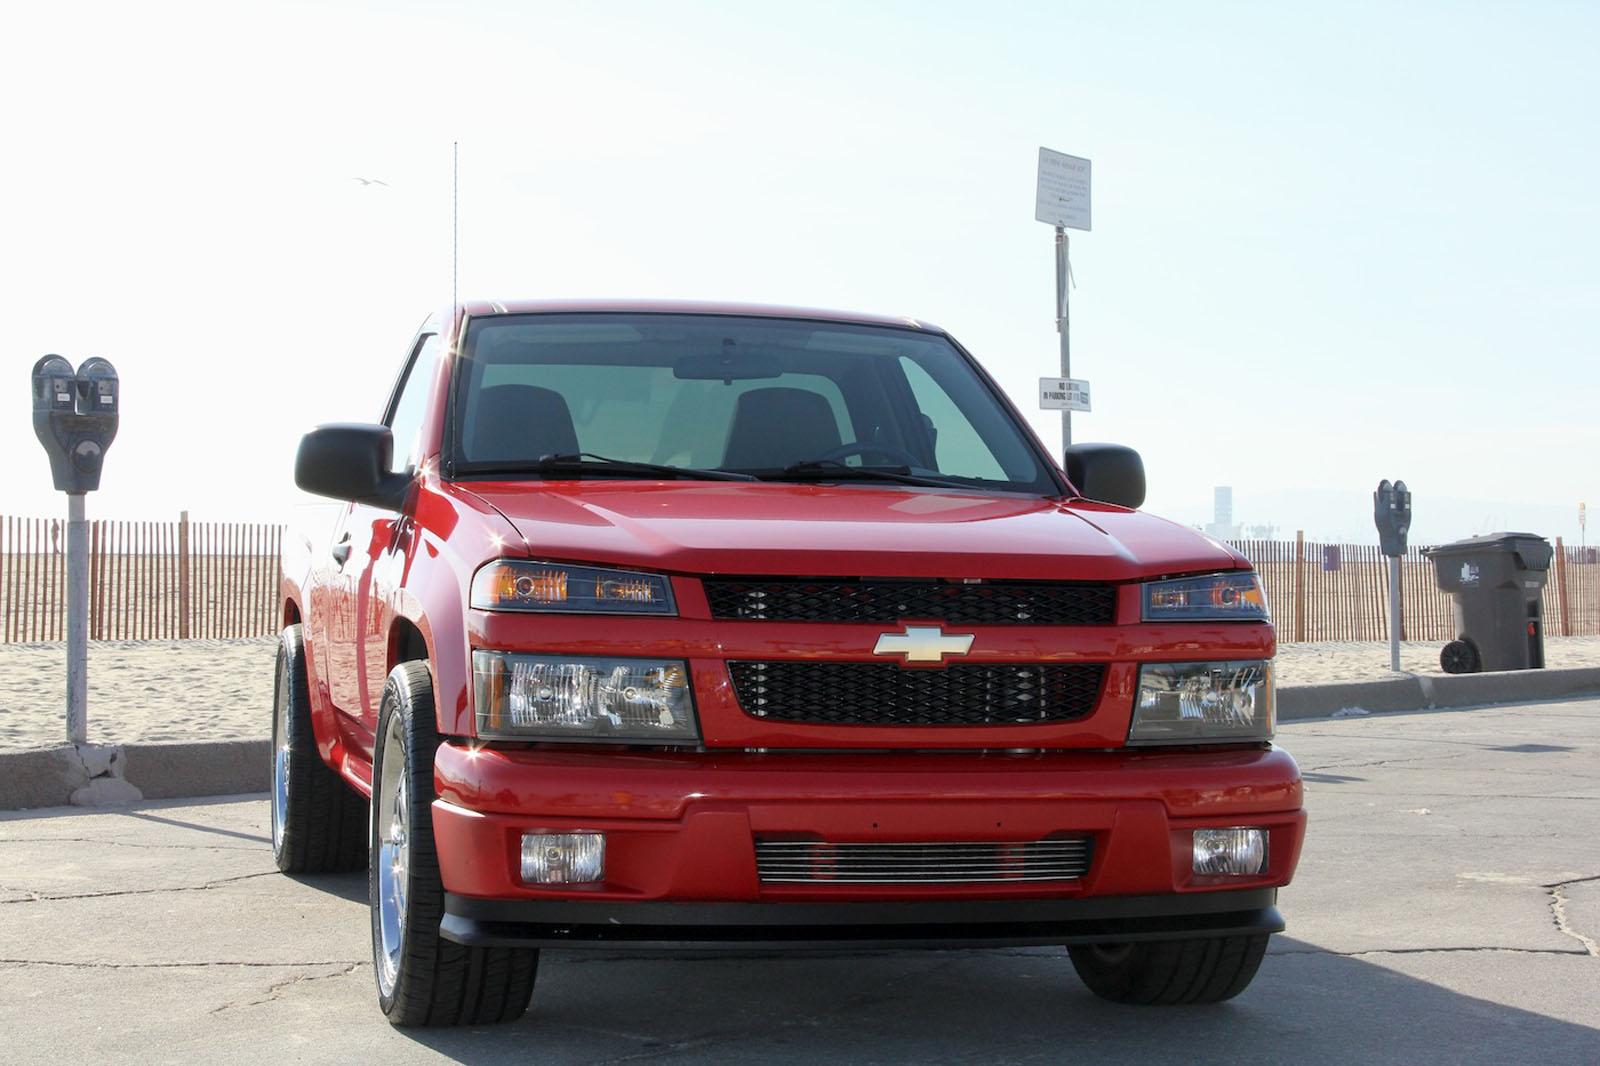 Colorado 2006 chevrolet colorado : 2006 Chevrolet Colorado LT For Sale | Long Beach California